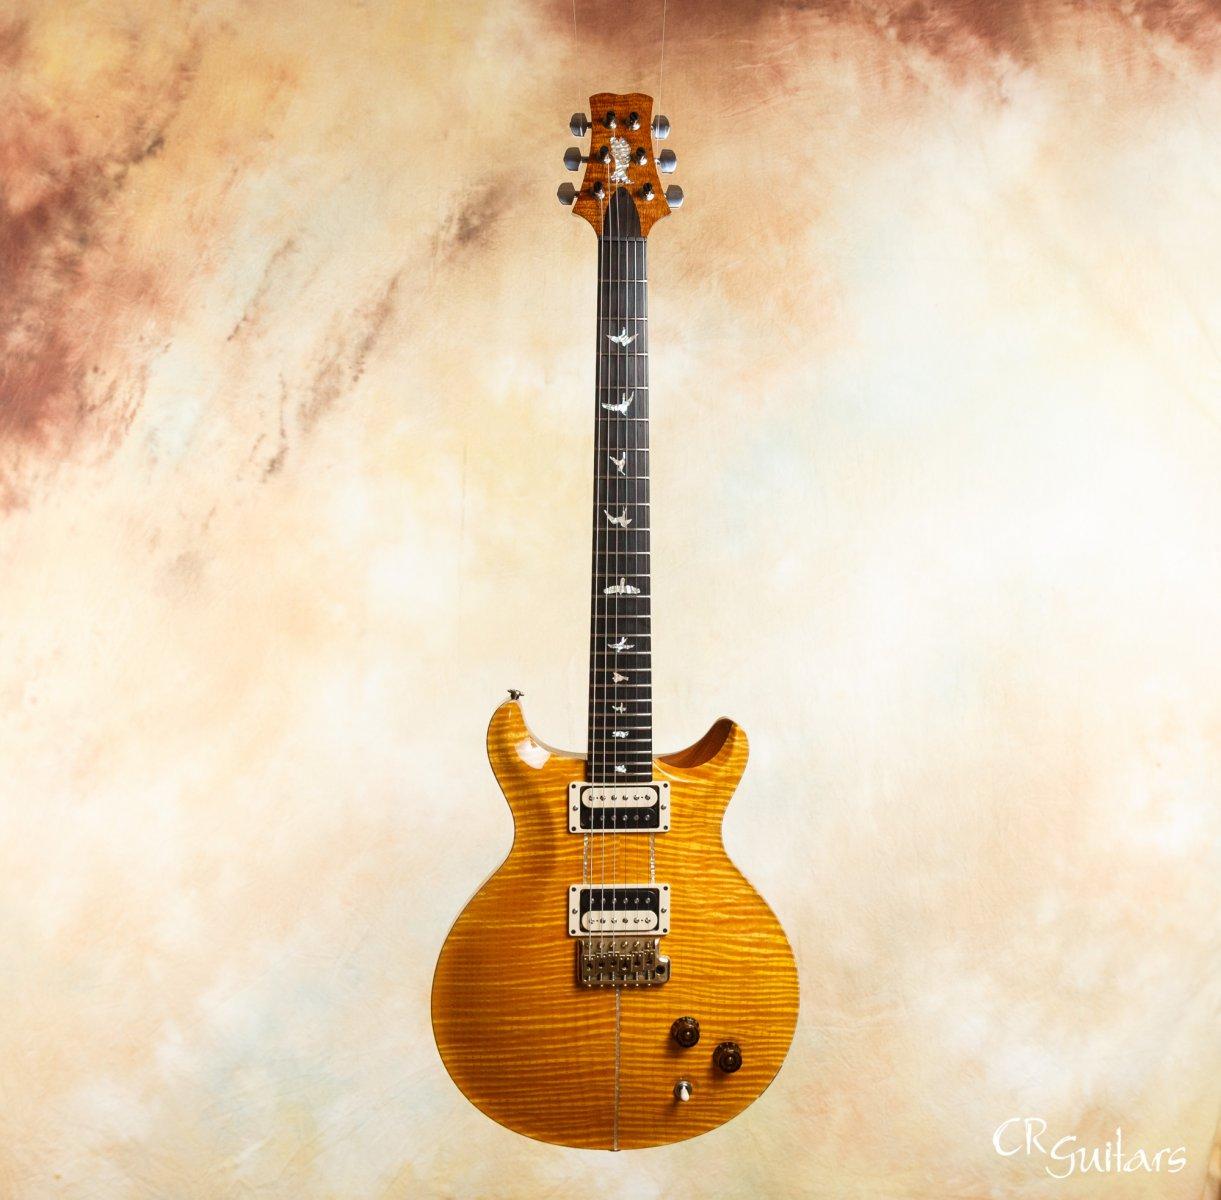 santana retro prs private stock cr guitars. Black Bedroom Furniture Sets. Home Design Ideas